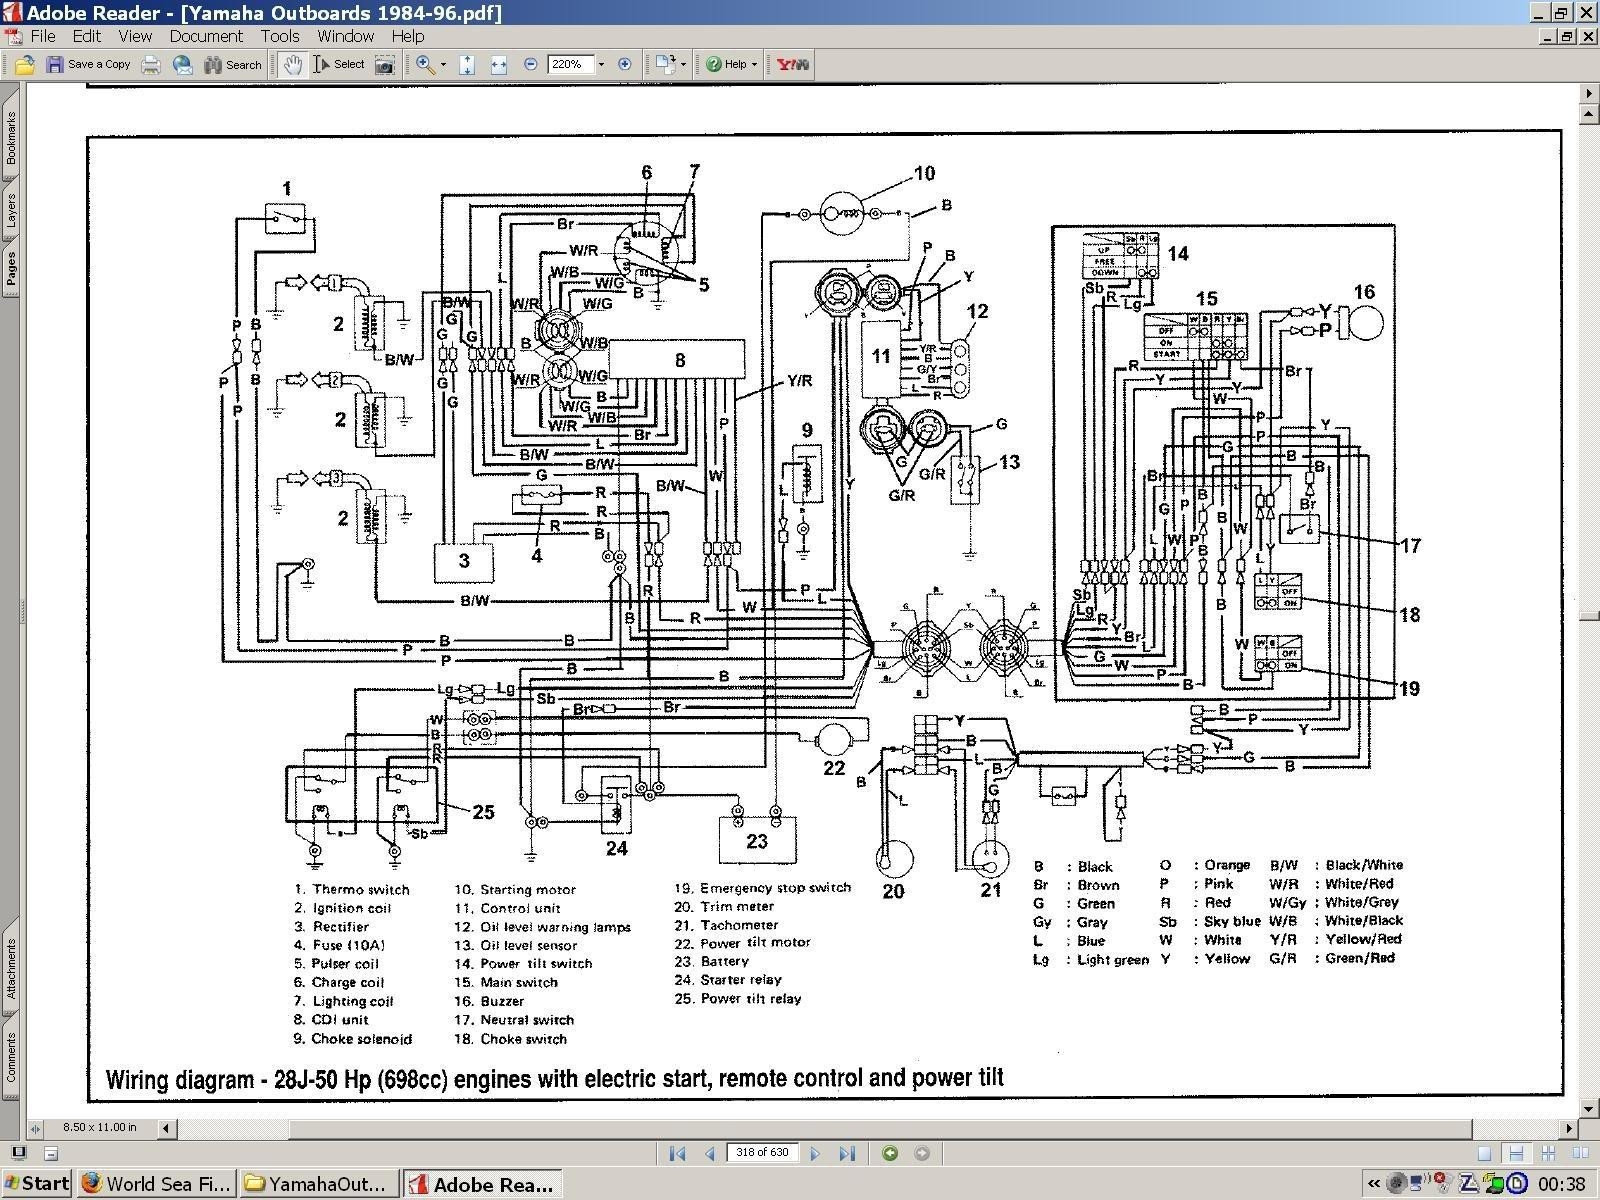 Mercury Outboard Power Tilt Wiring Diagram - Wiring Diagrams ... on